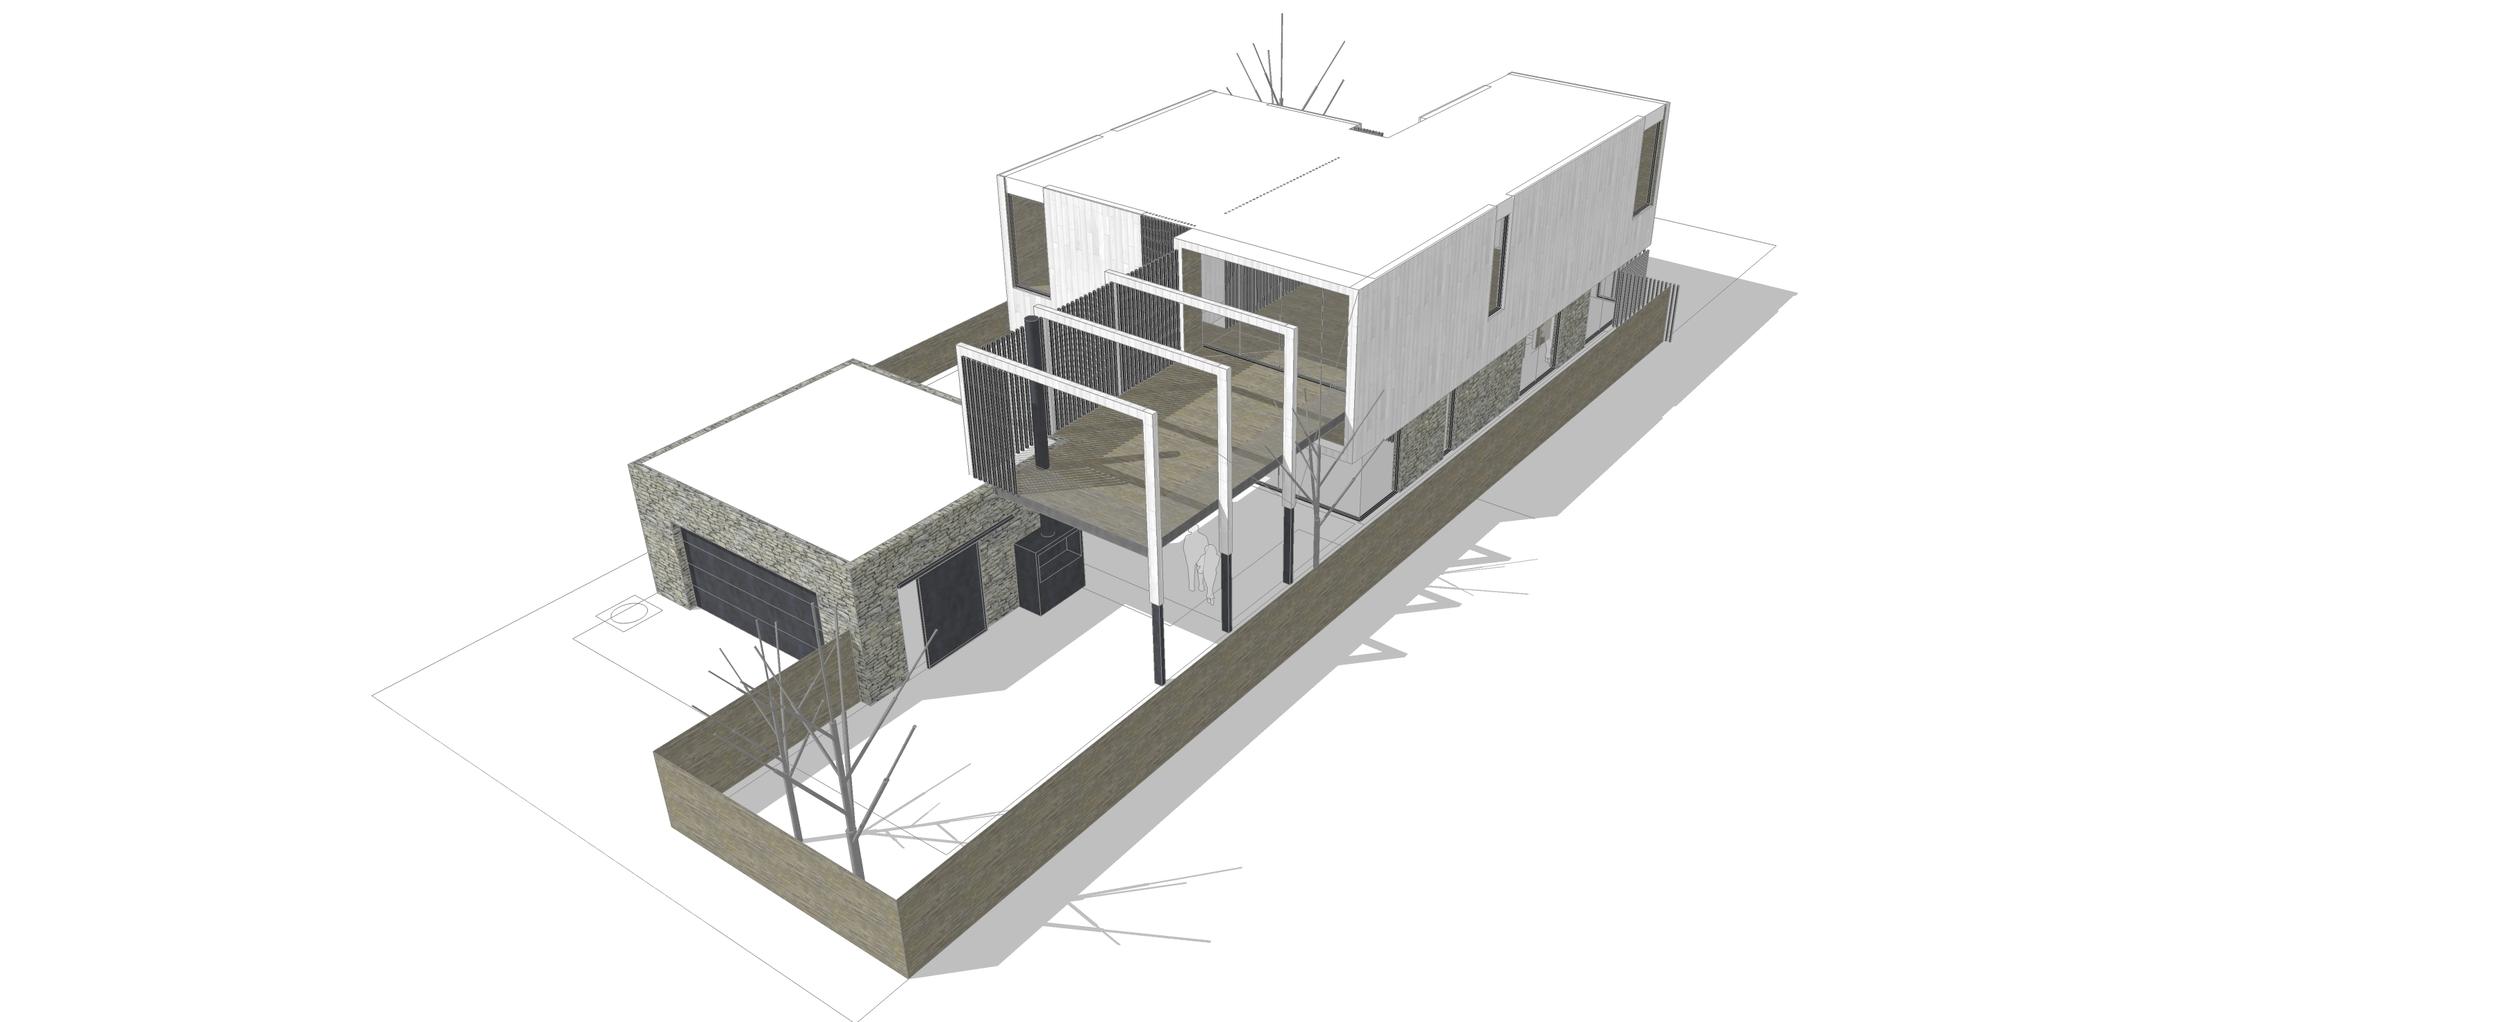 Scheme 2_0T:  Level 2 Outdoor Terrace